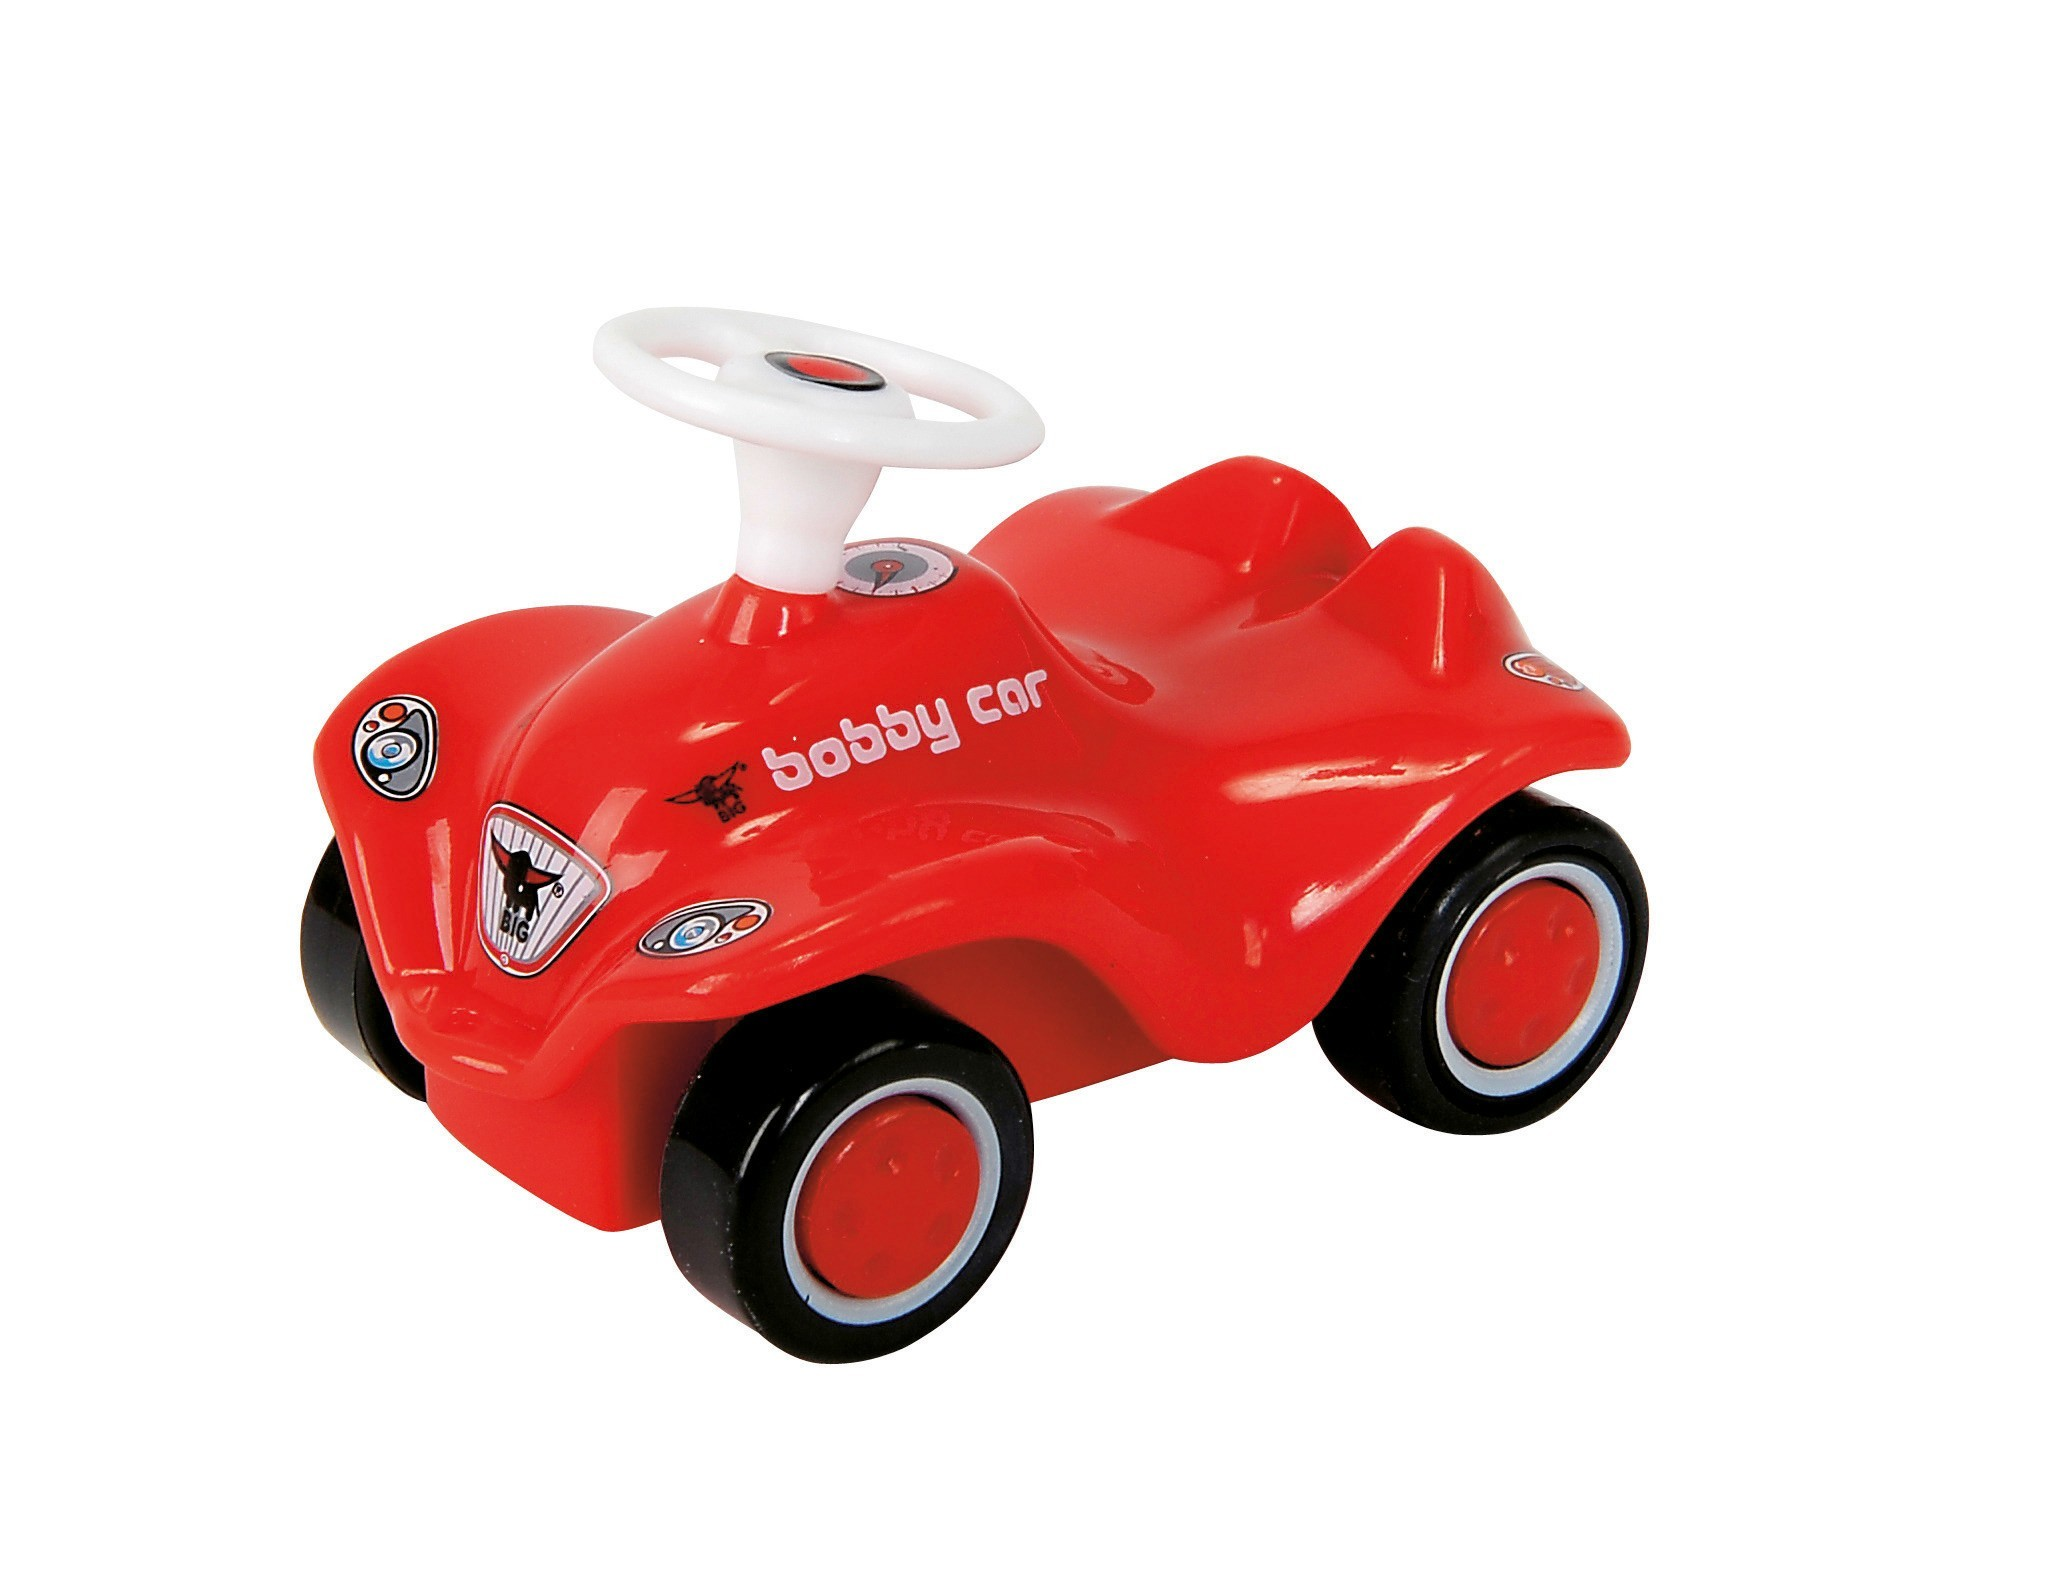 big new bobby car mini fahrzeug auto r ckzugmotor 56969. Black Bedroom Furniture Sets. Home Design Ideas